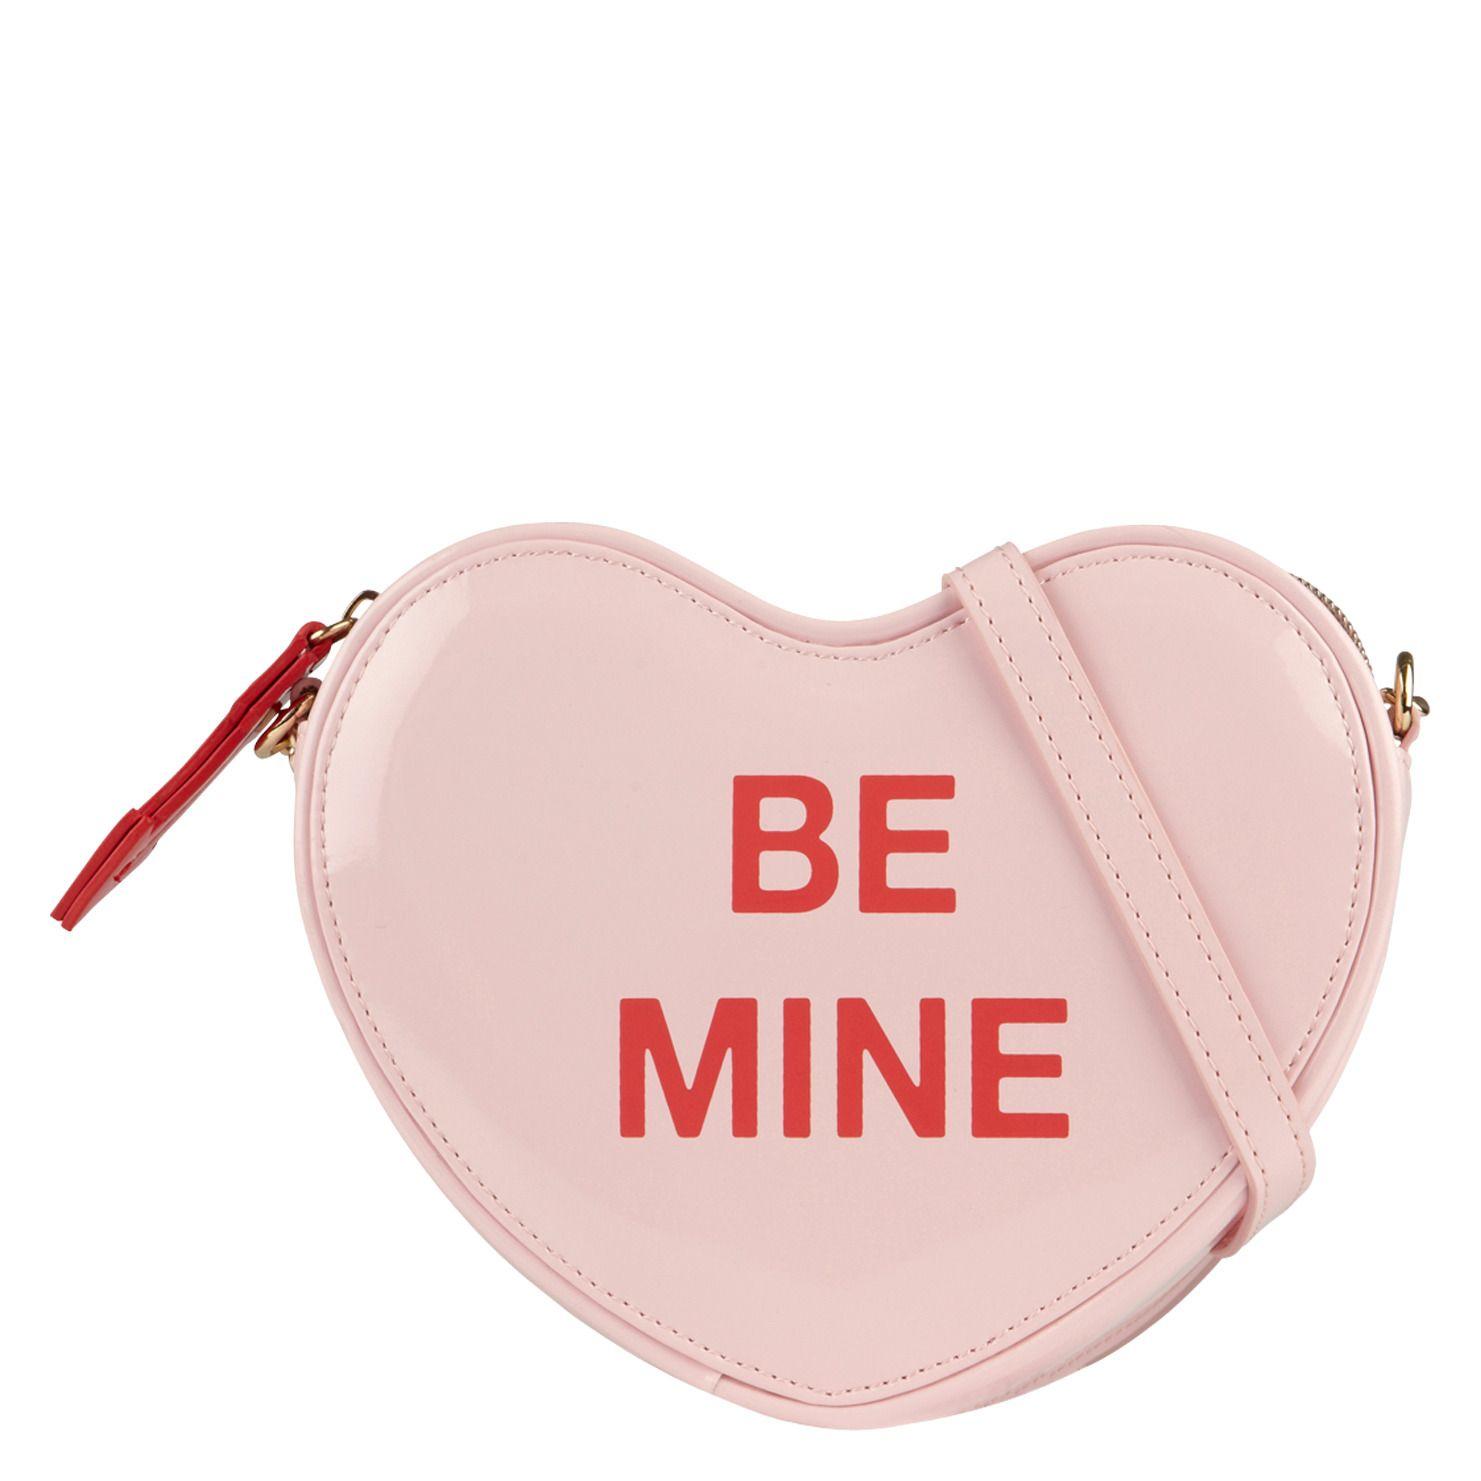 GIRIDDIN - handbags's CROSSBODY & MESSENGER BAGS for sale at ALDO Shoes. love heart conversation purse